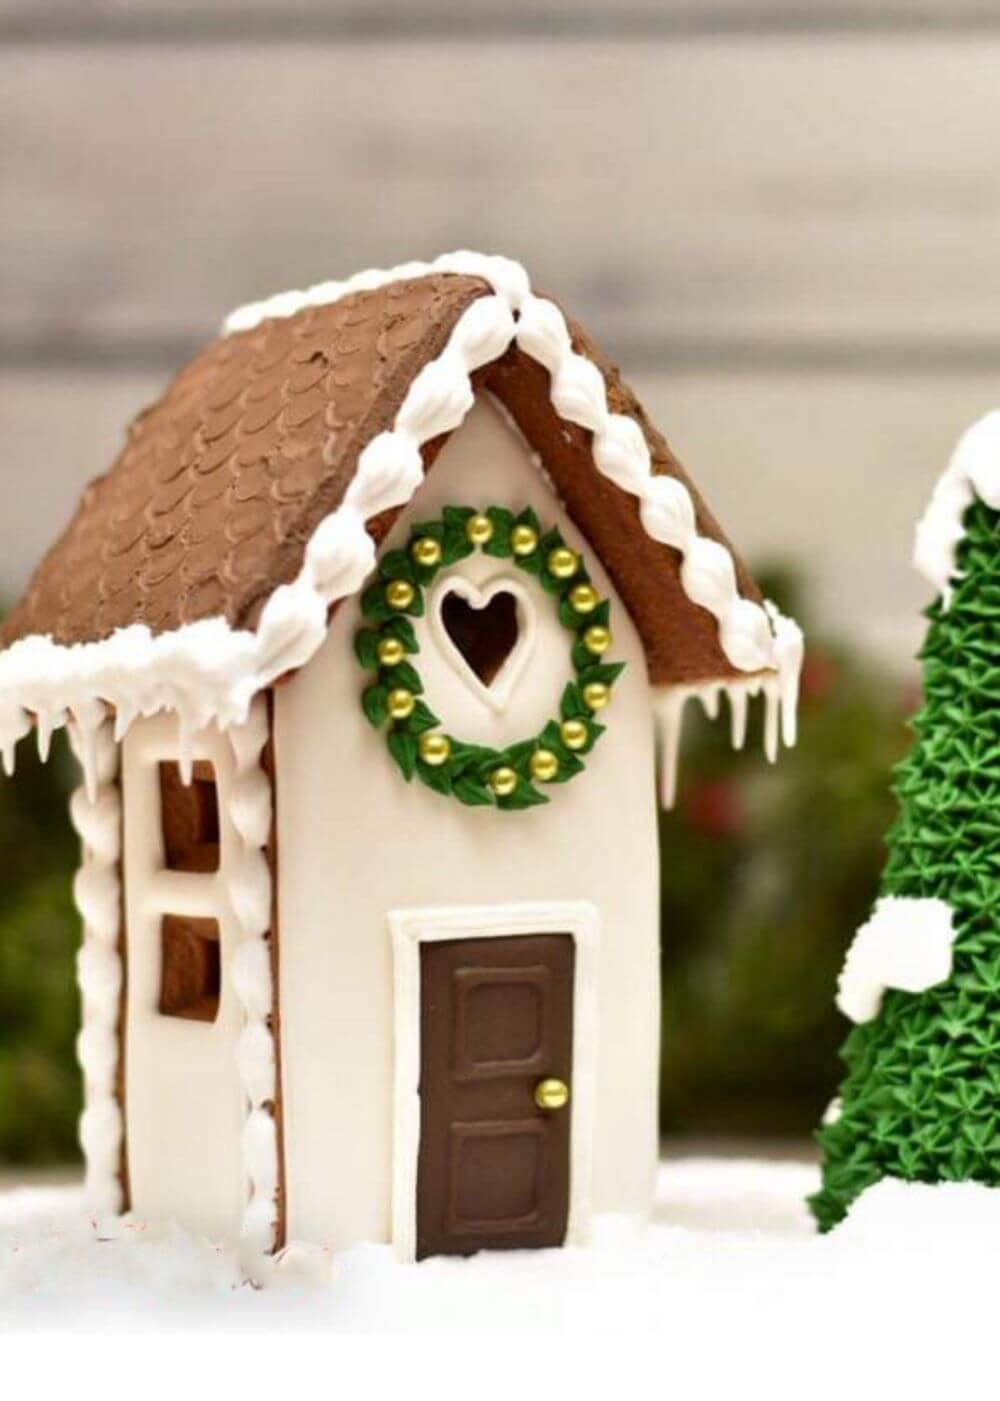 Name-Gingerbread House_Tag-Celebrations Vignettes_Season-Winter Christmas